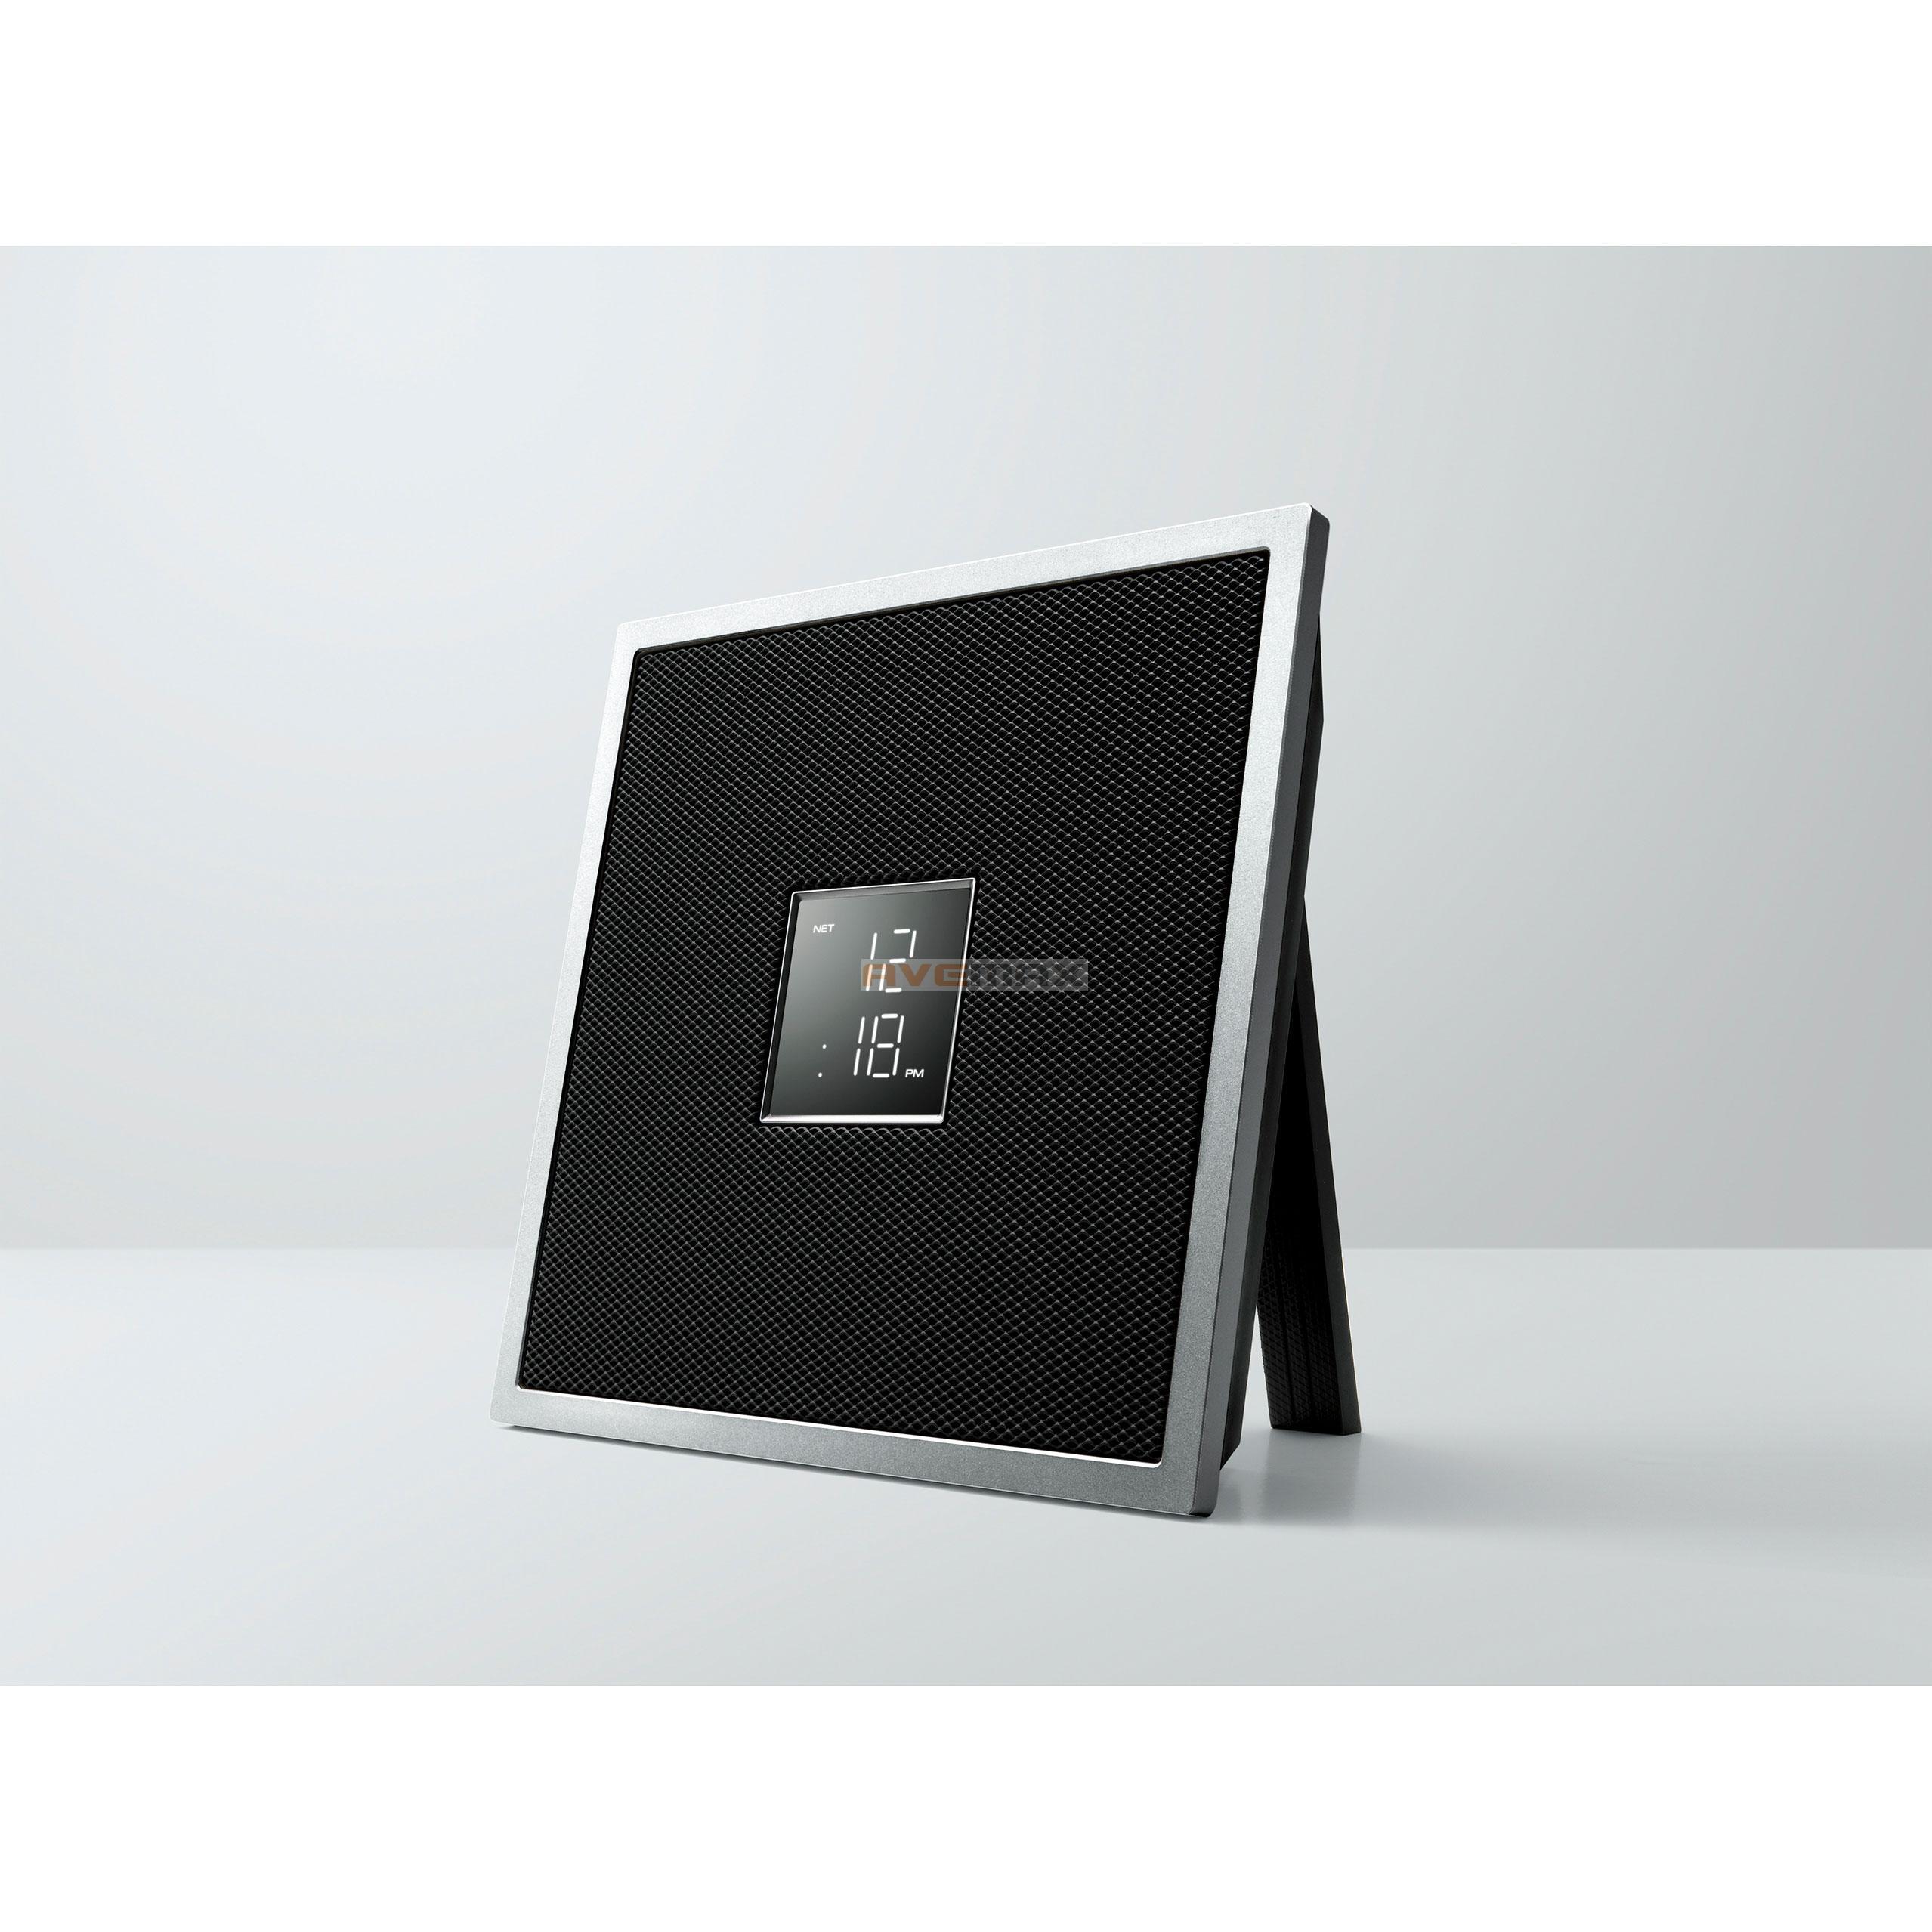 yamaha isx 18d black yamaha shop yamaha audio premium hifi. Black Bedroom Furniture Sets. Home Design Ideas